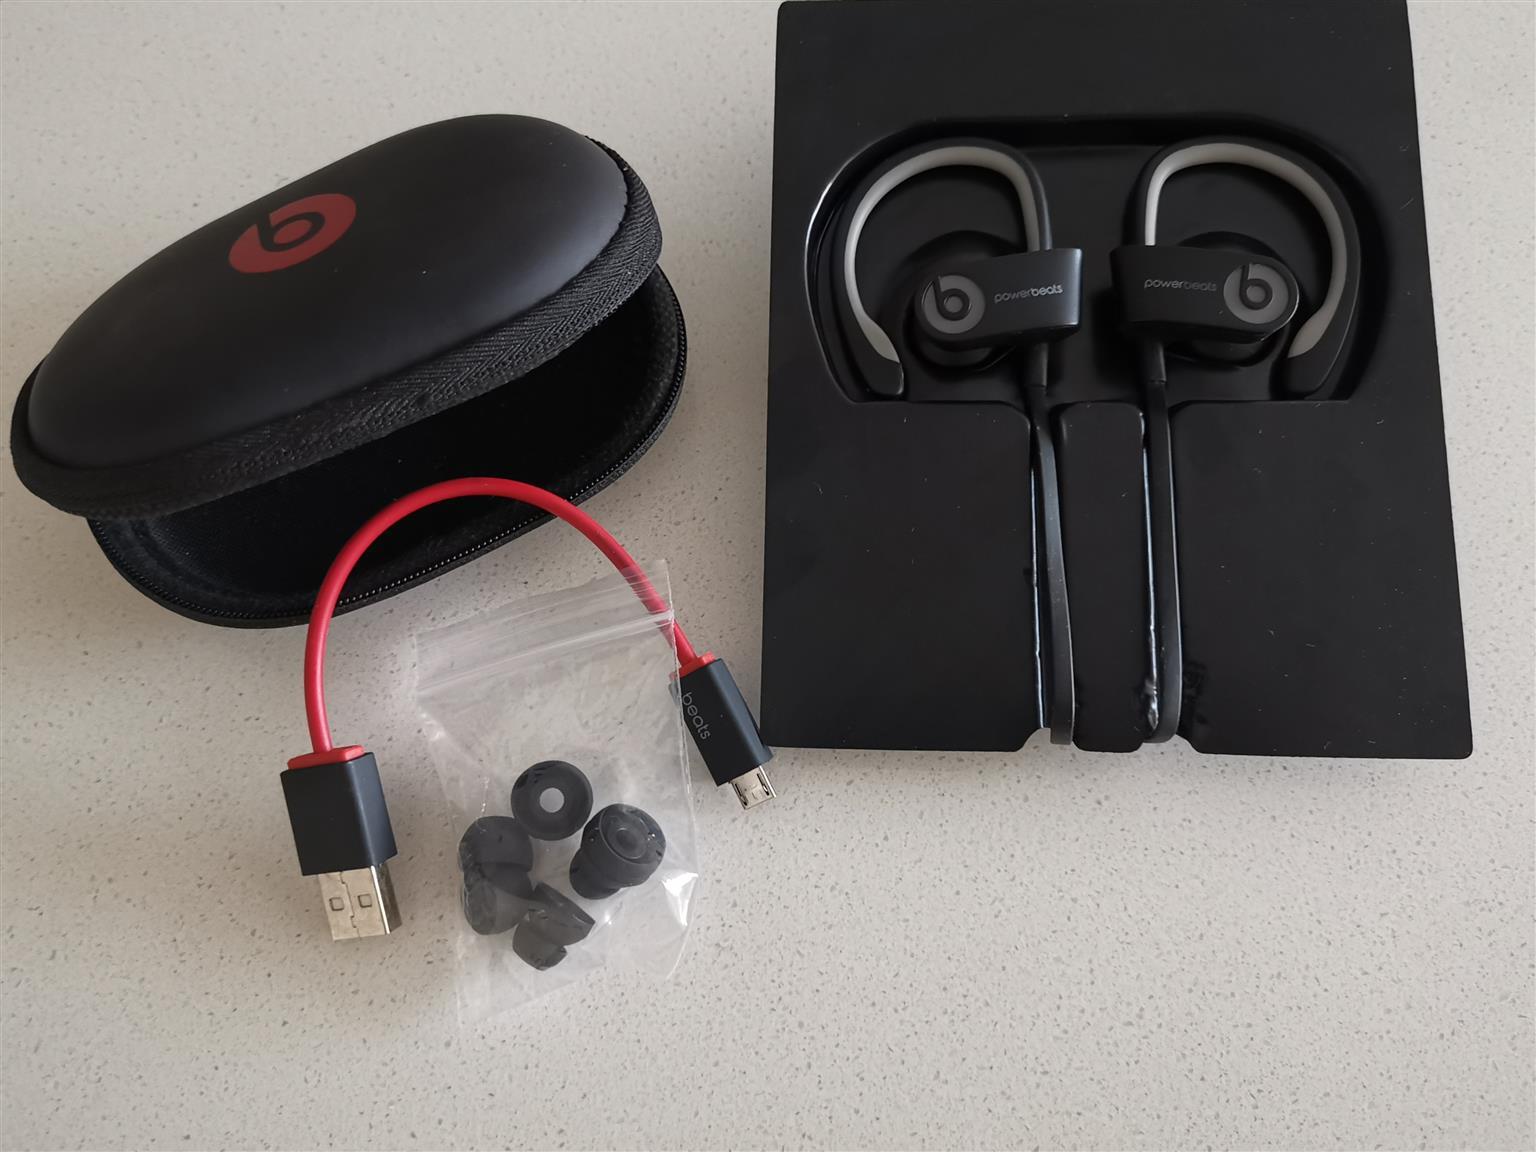 Power beats 2 wireless - R1200